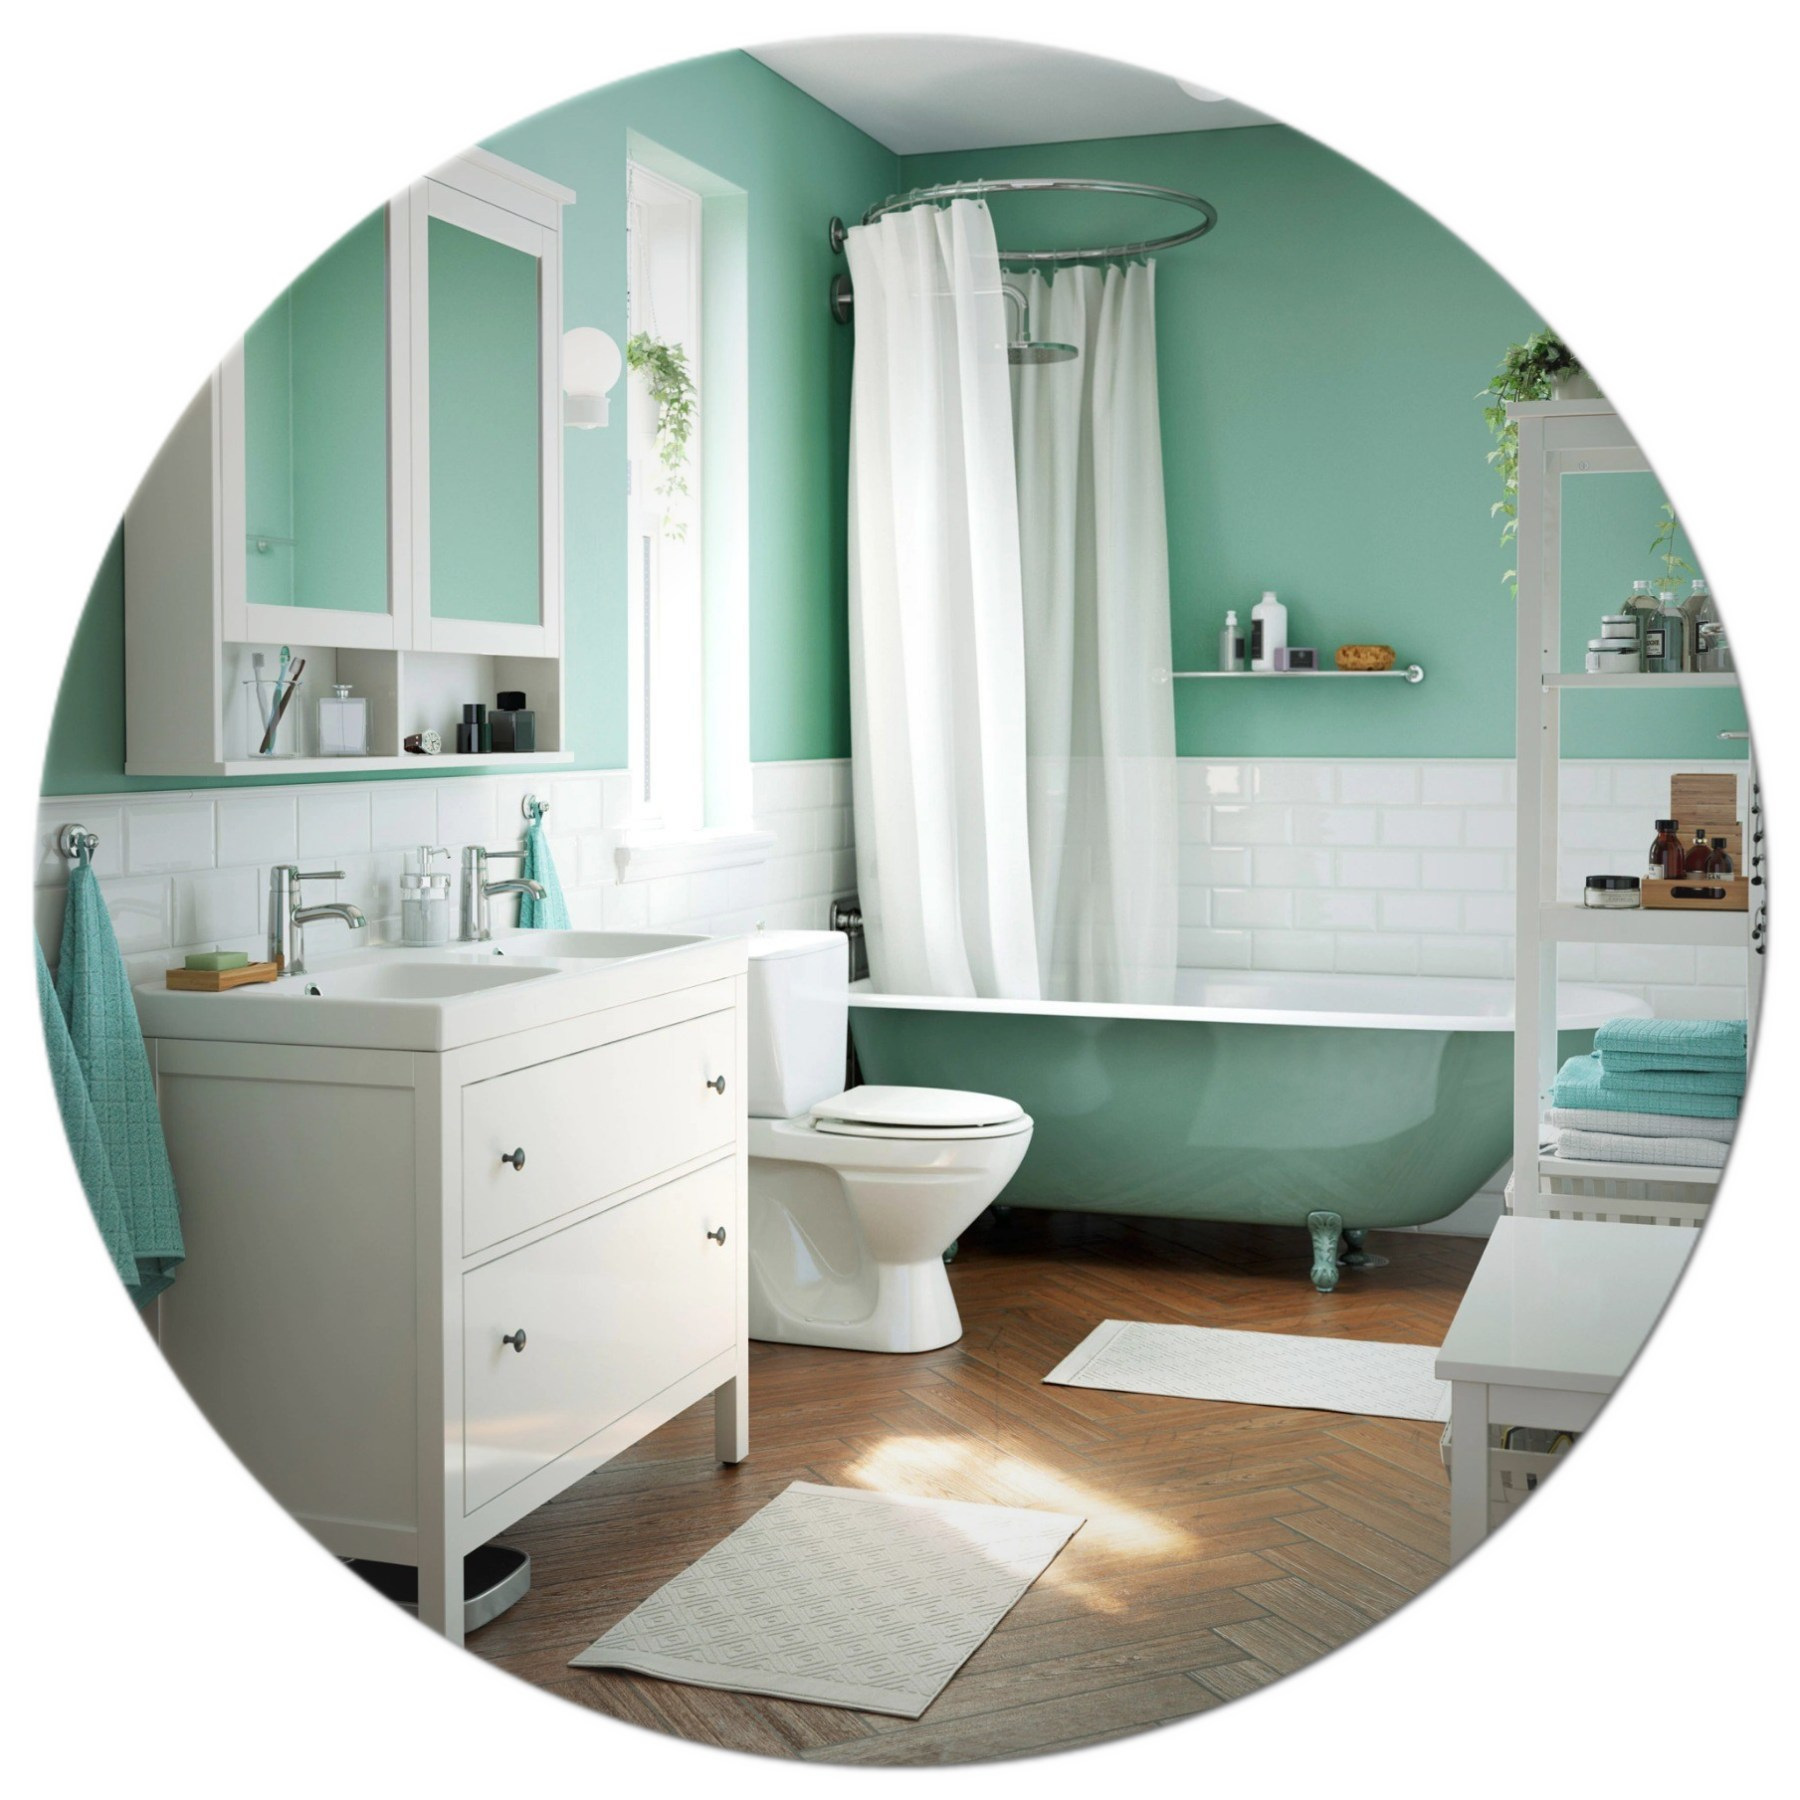 BathroomCleaning.jpg